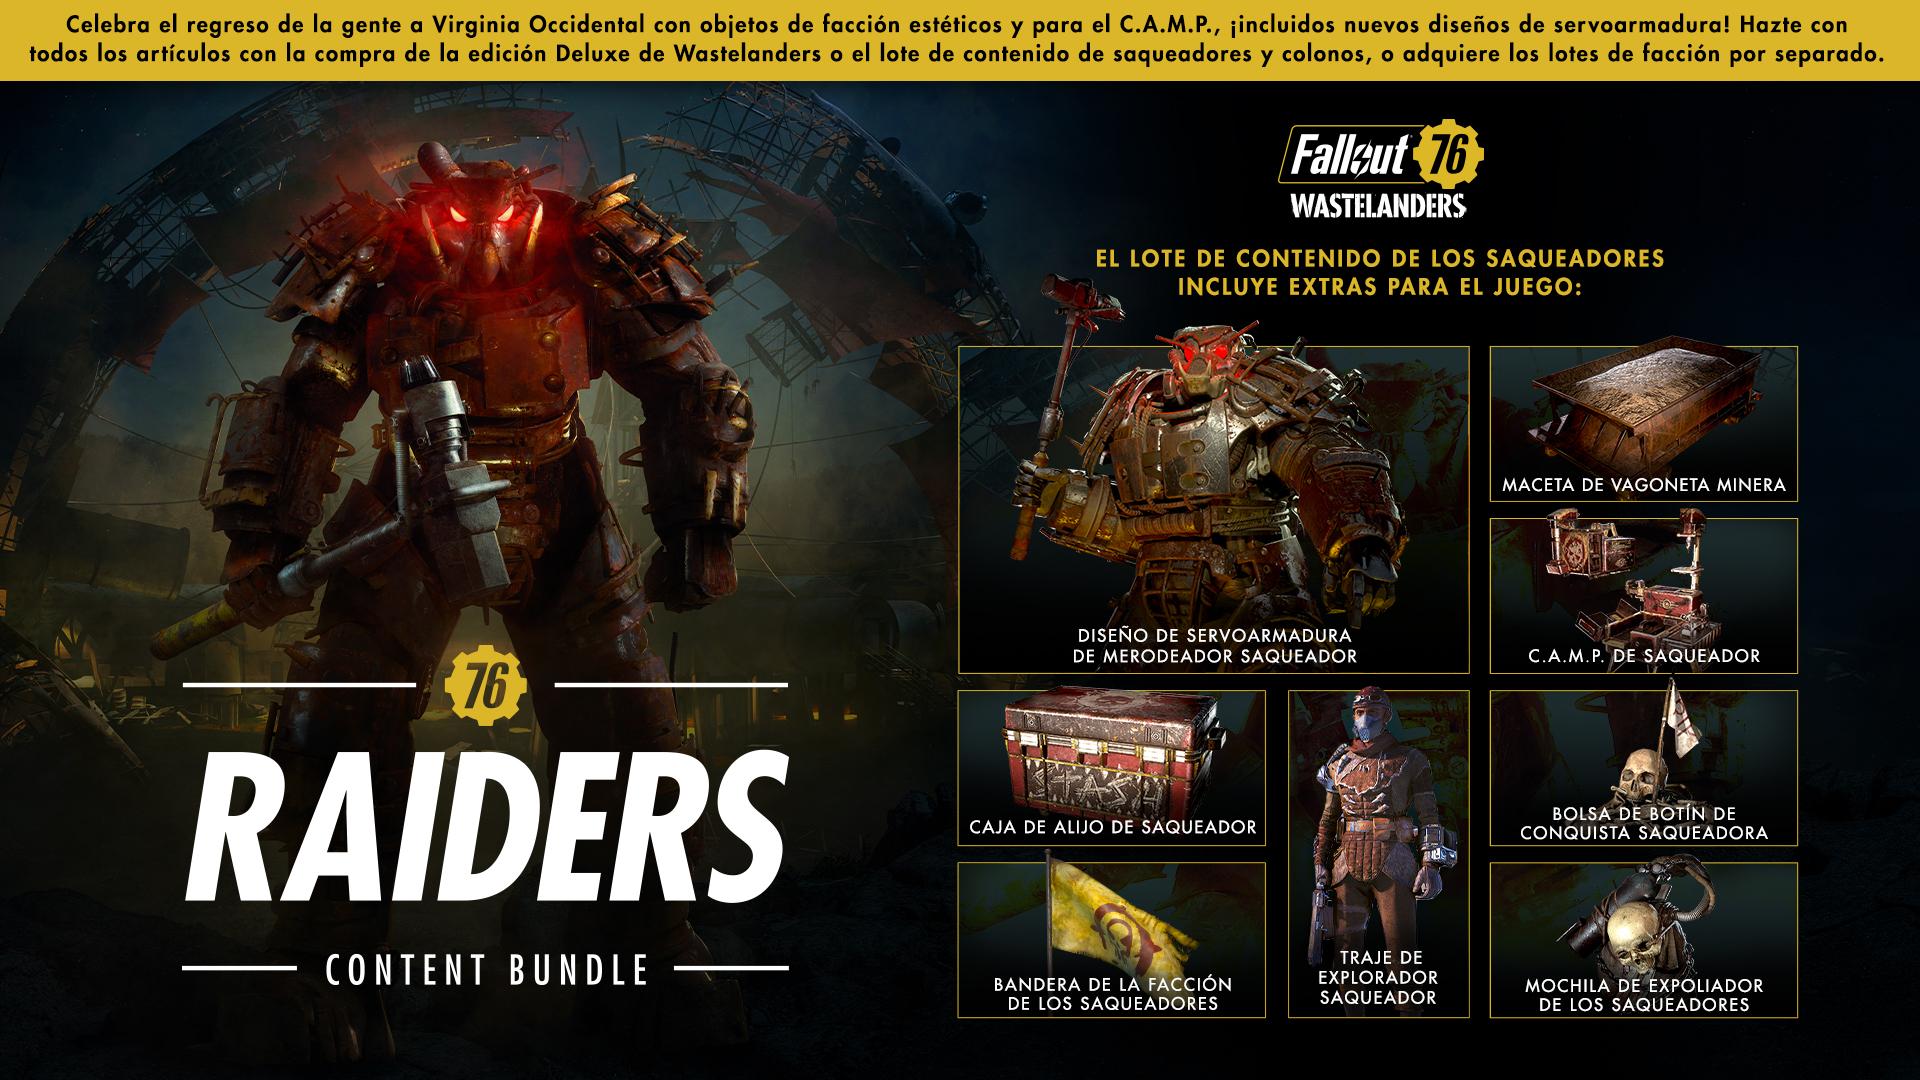 Fallout76-Wastelanders RaidersVanity 1920x1080-03-ES